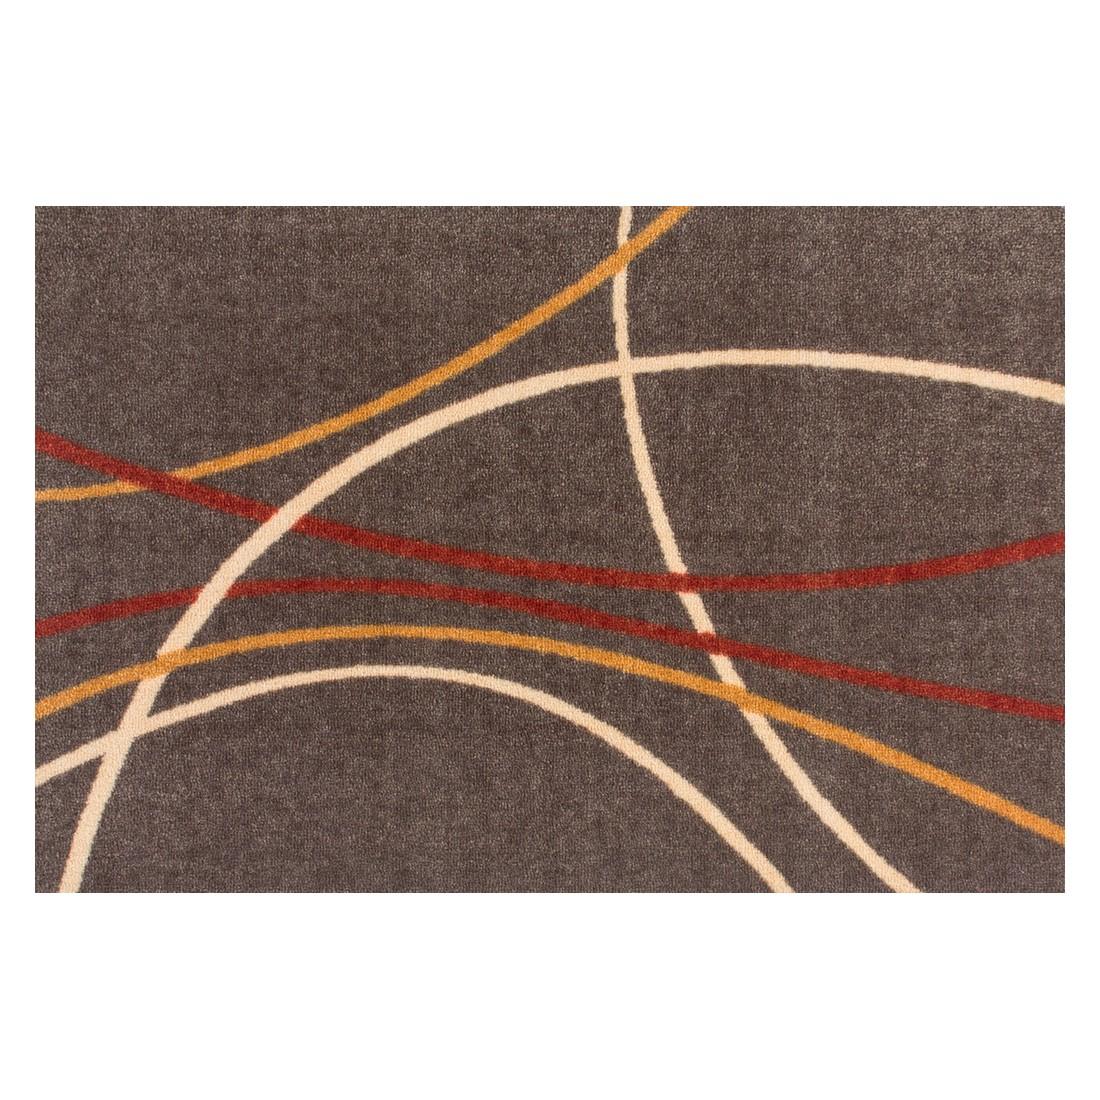 Fuß- & Saubermachmatte Salü IV – 60 x 90 cm, Kayoom kaufen